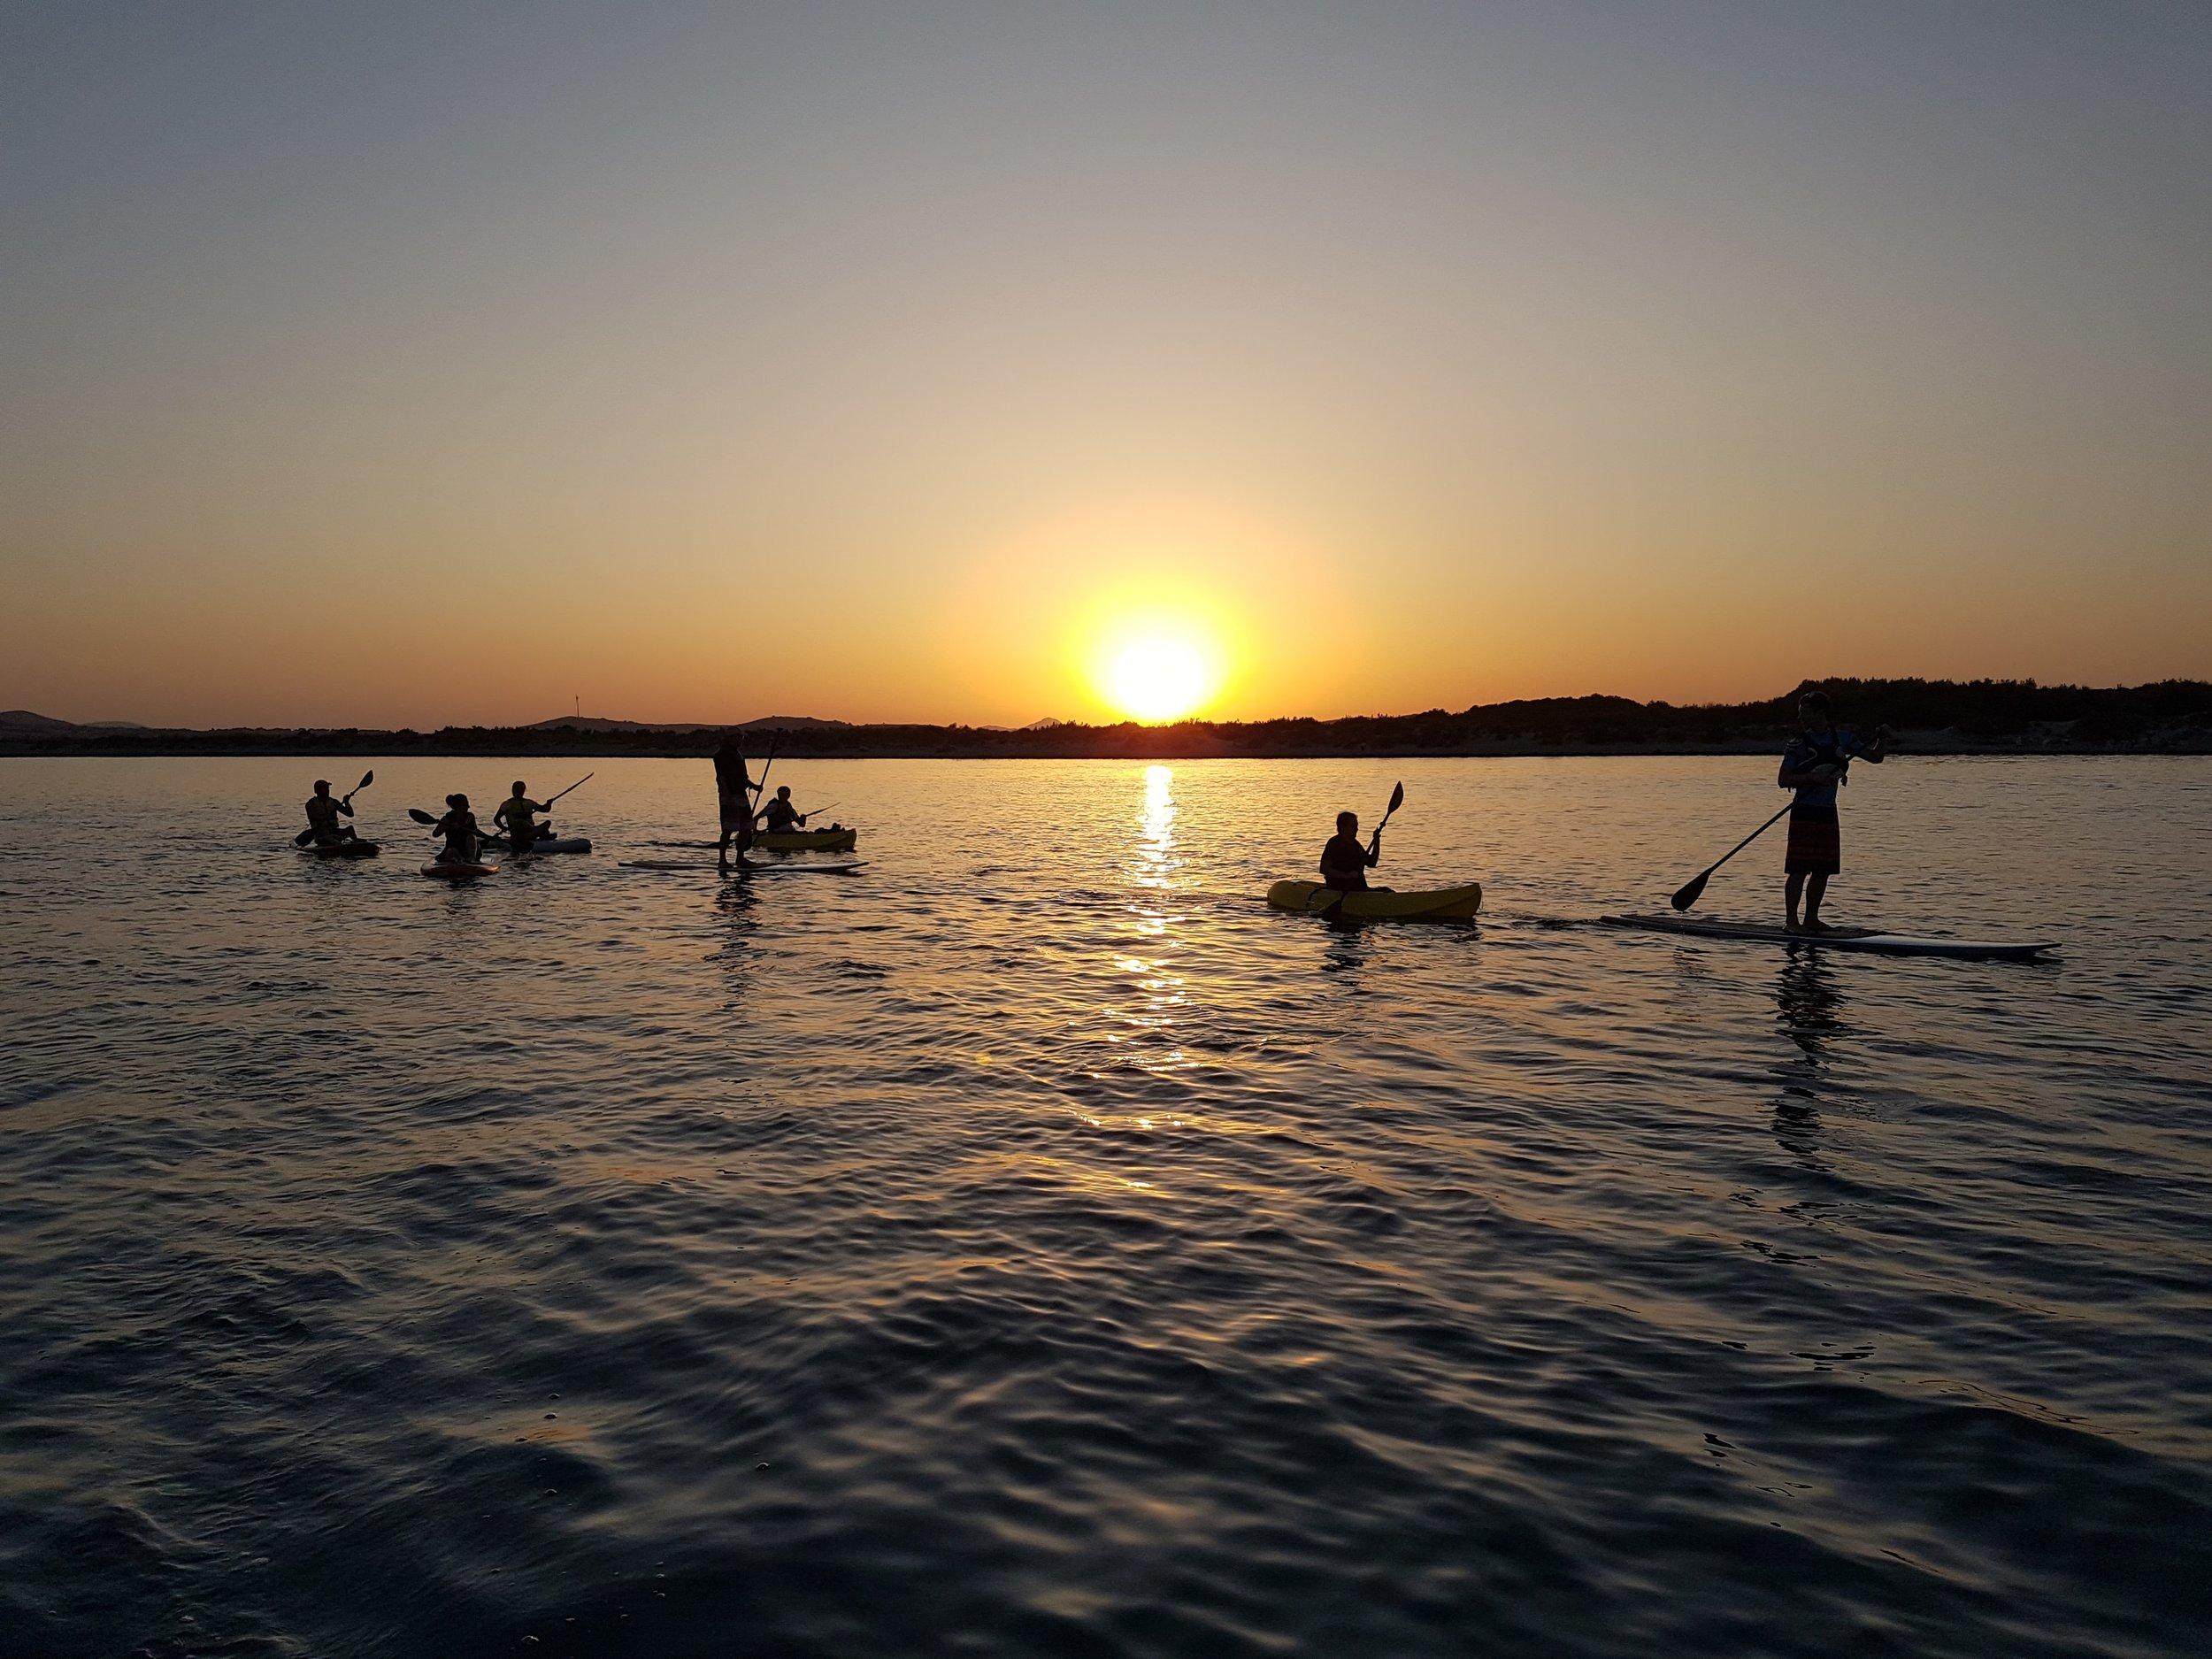 Sunset Paddle - Day 2